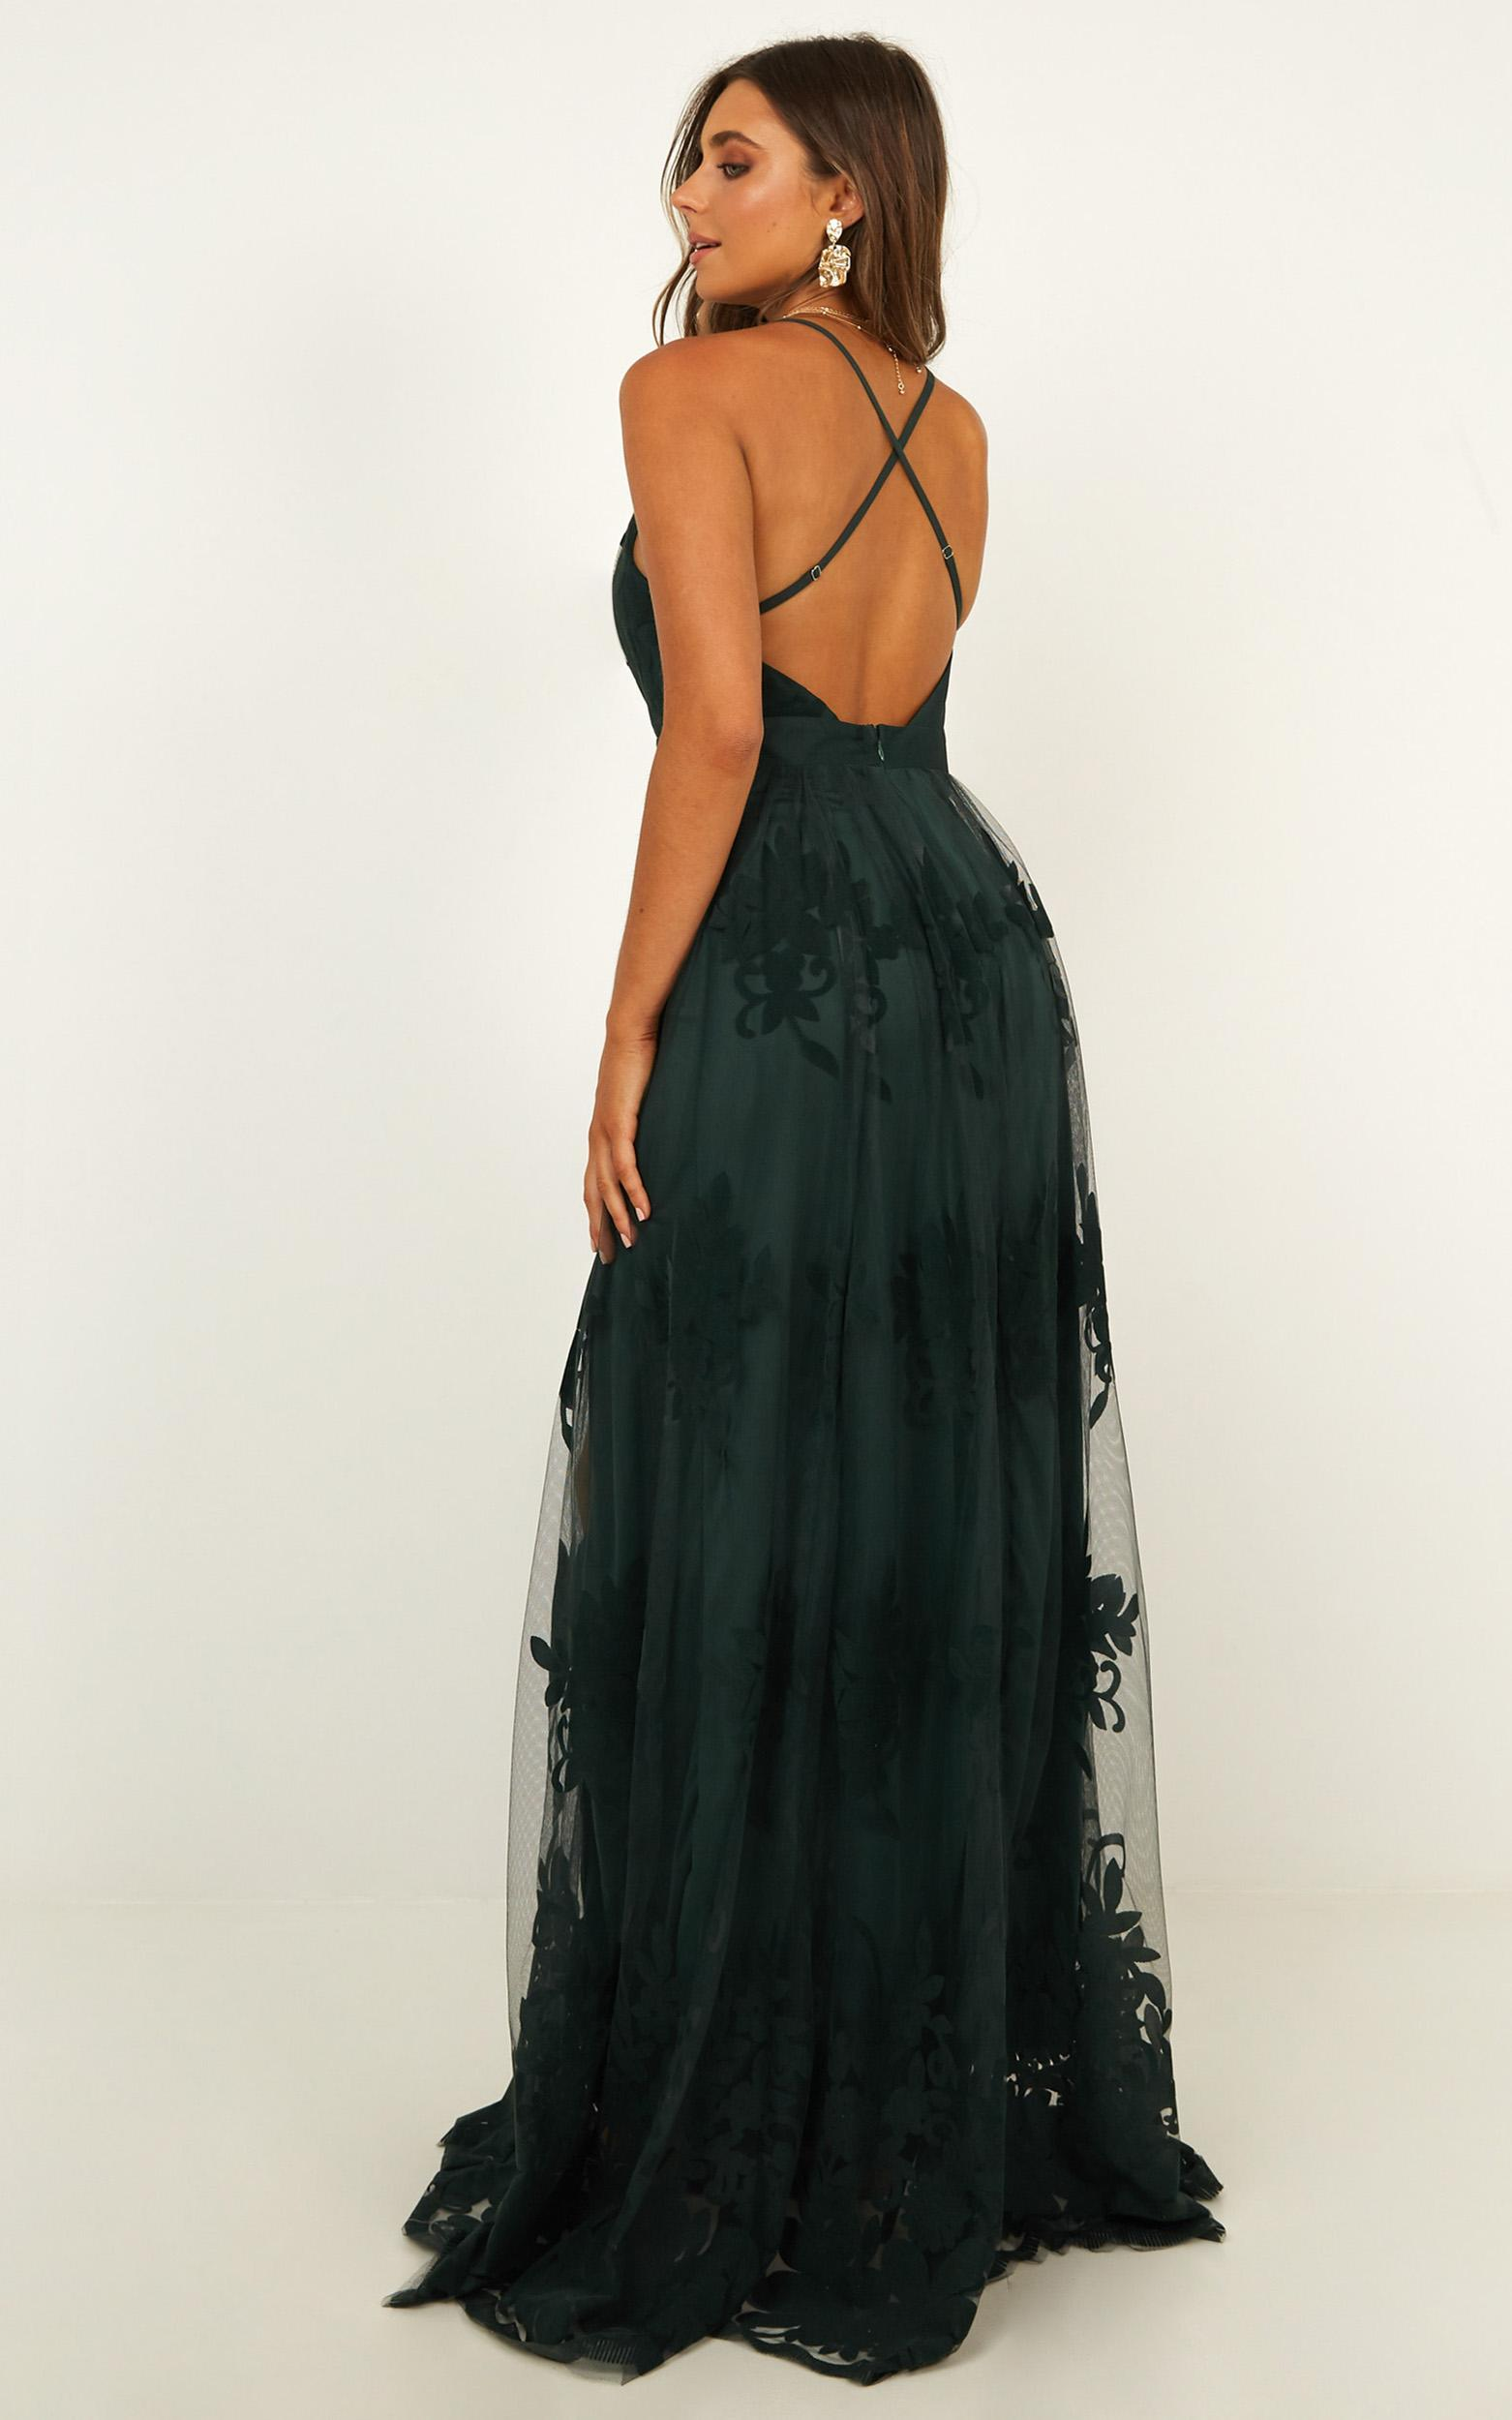 Promenade Maxi Dress In Emerald - 16 (XXL), Green, hi-res image number null